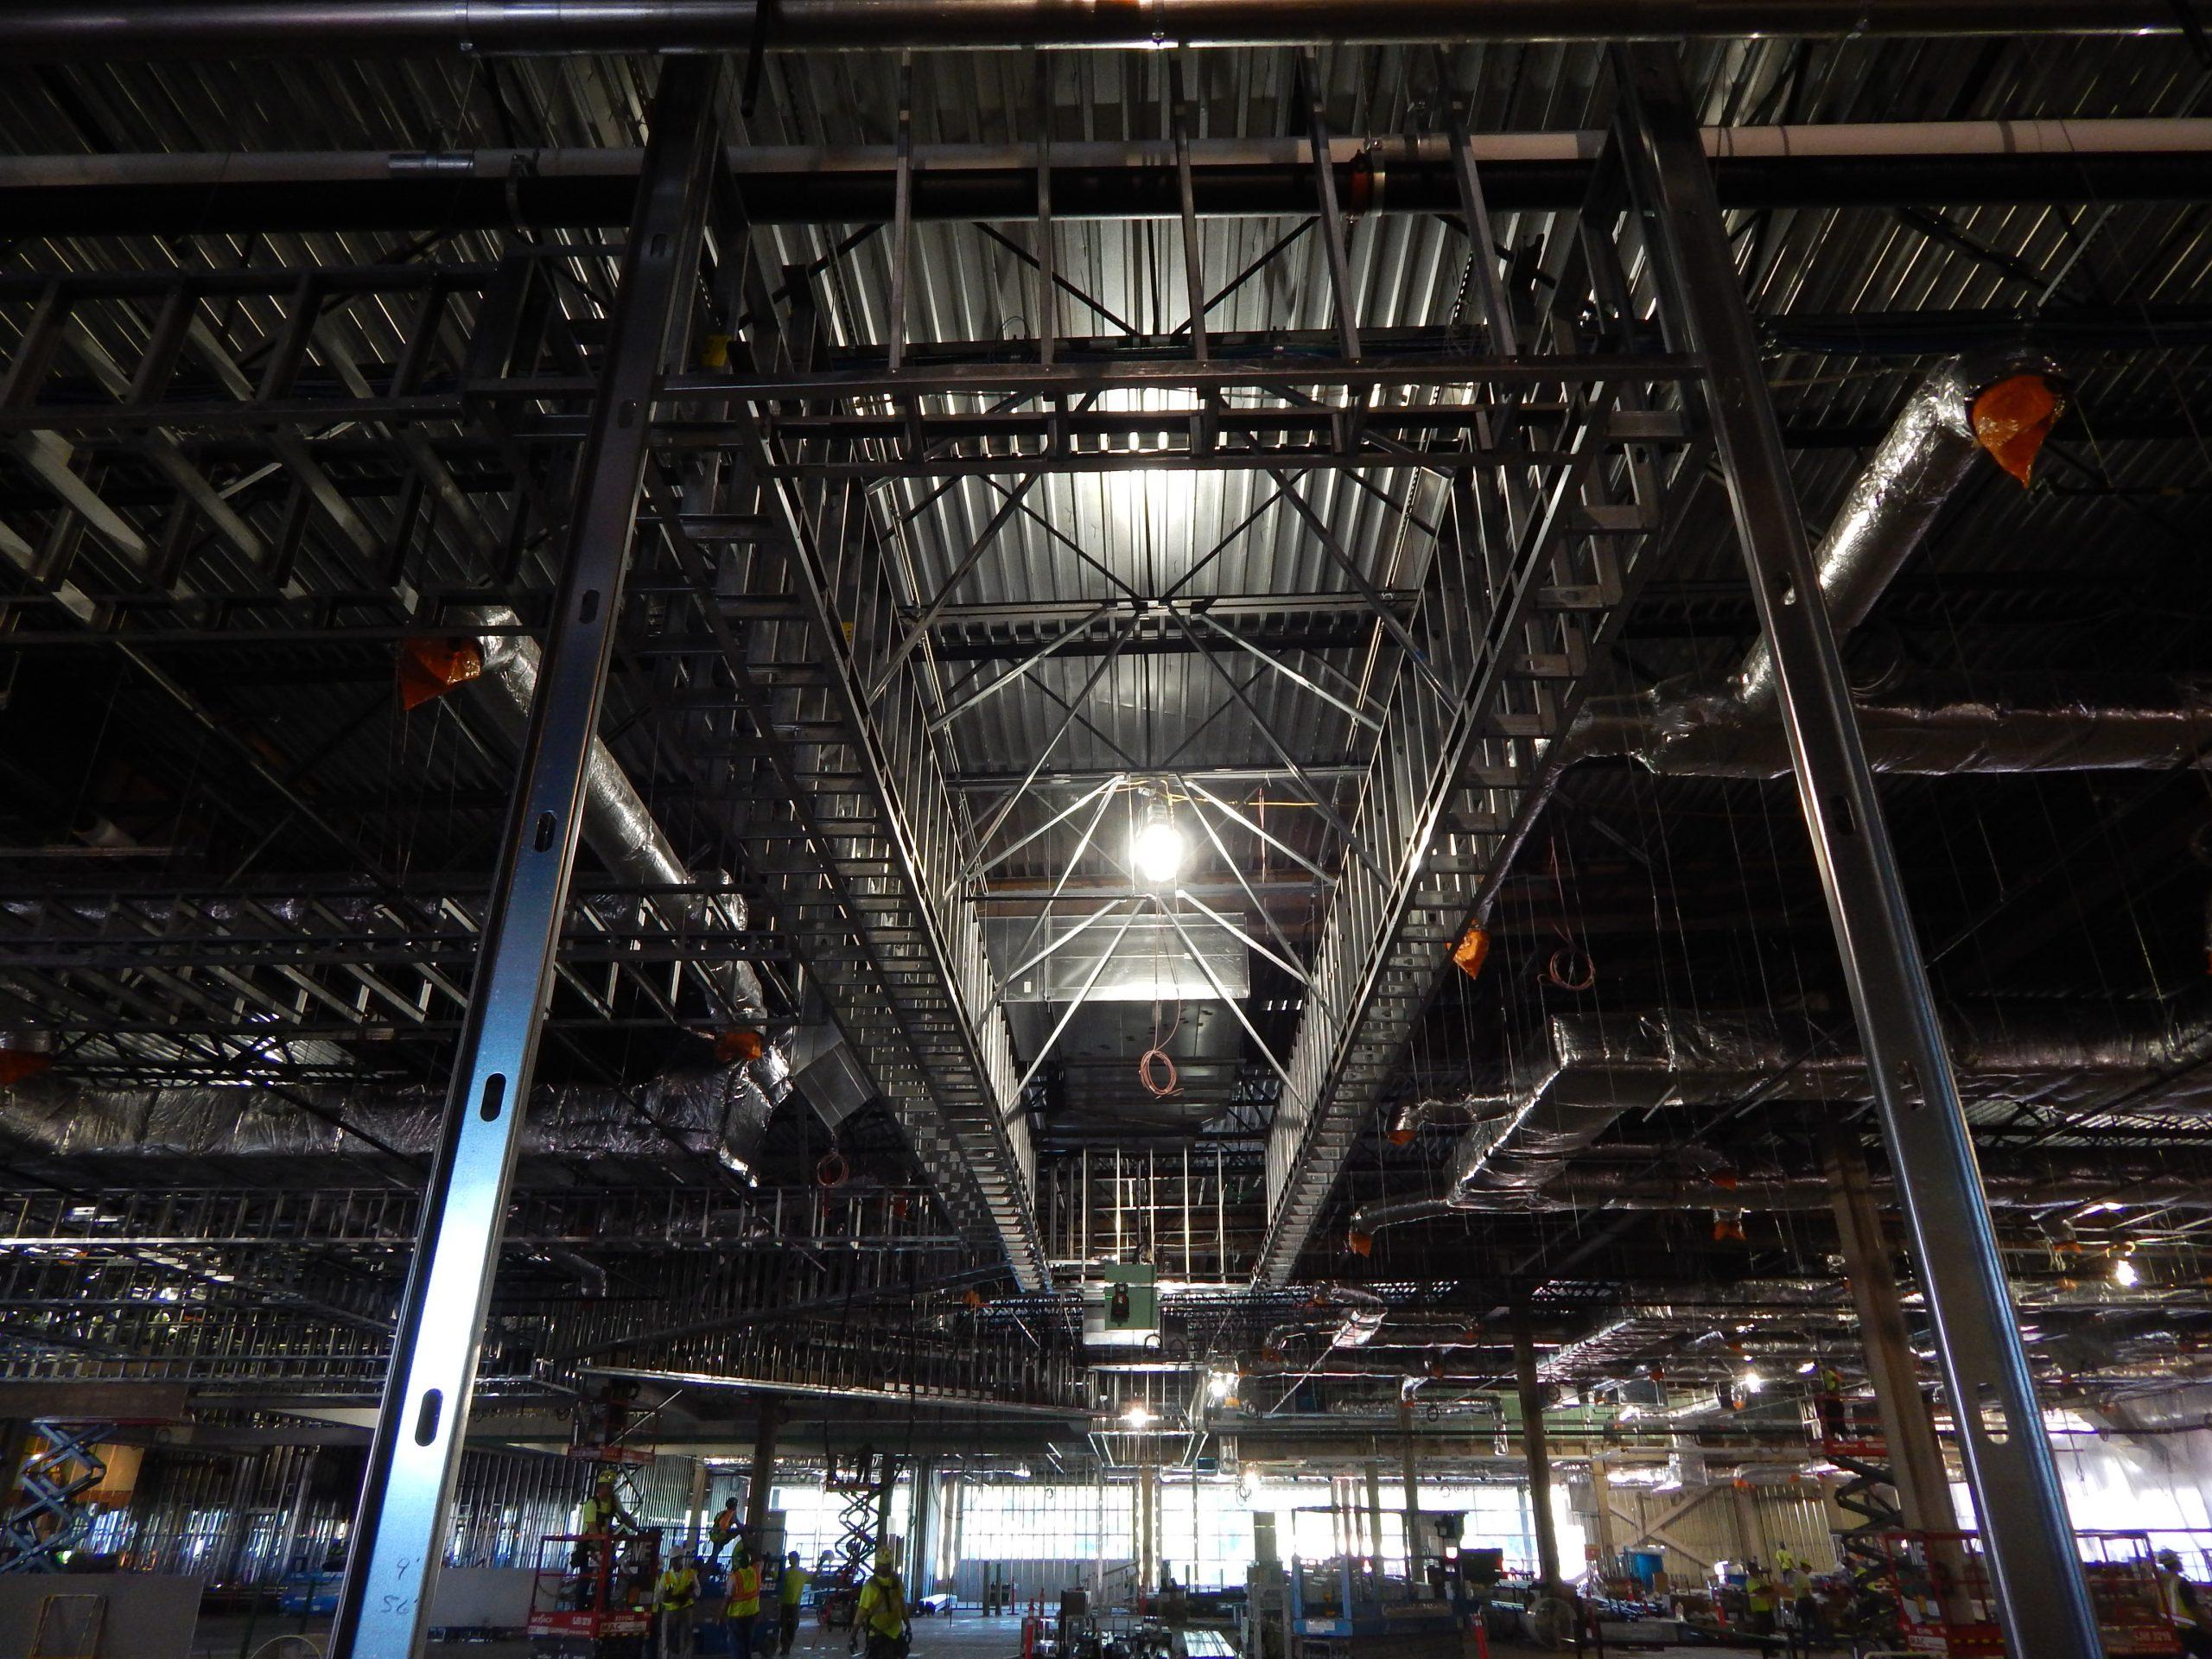 prefabricated steel framing at rivers casino